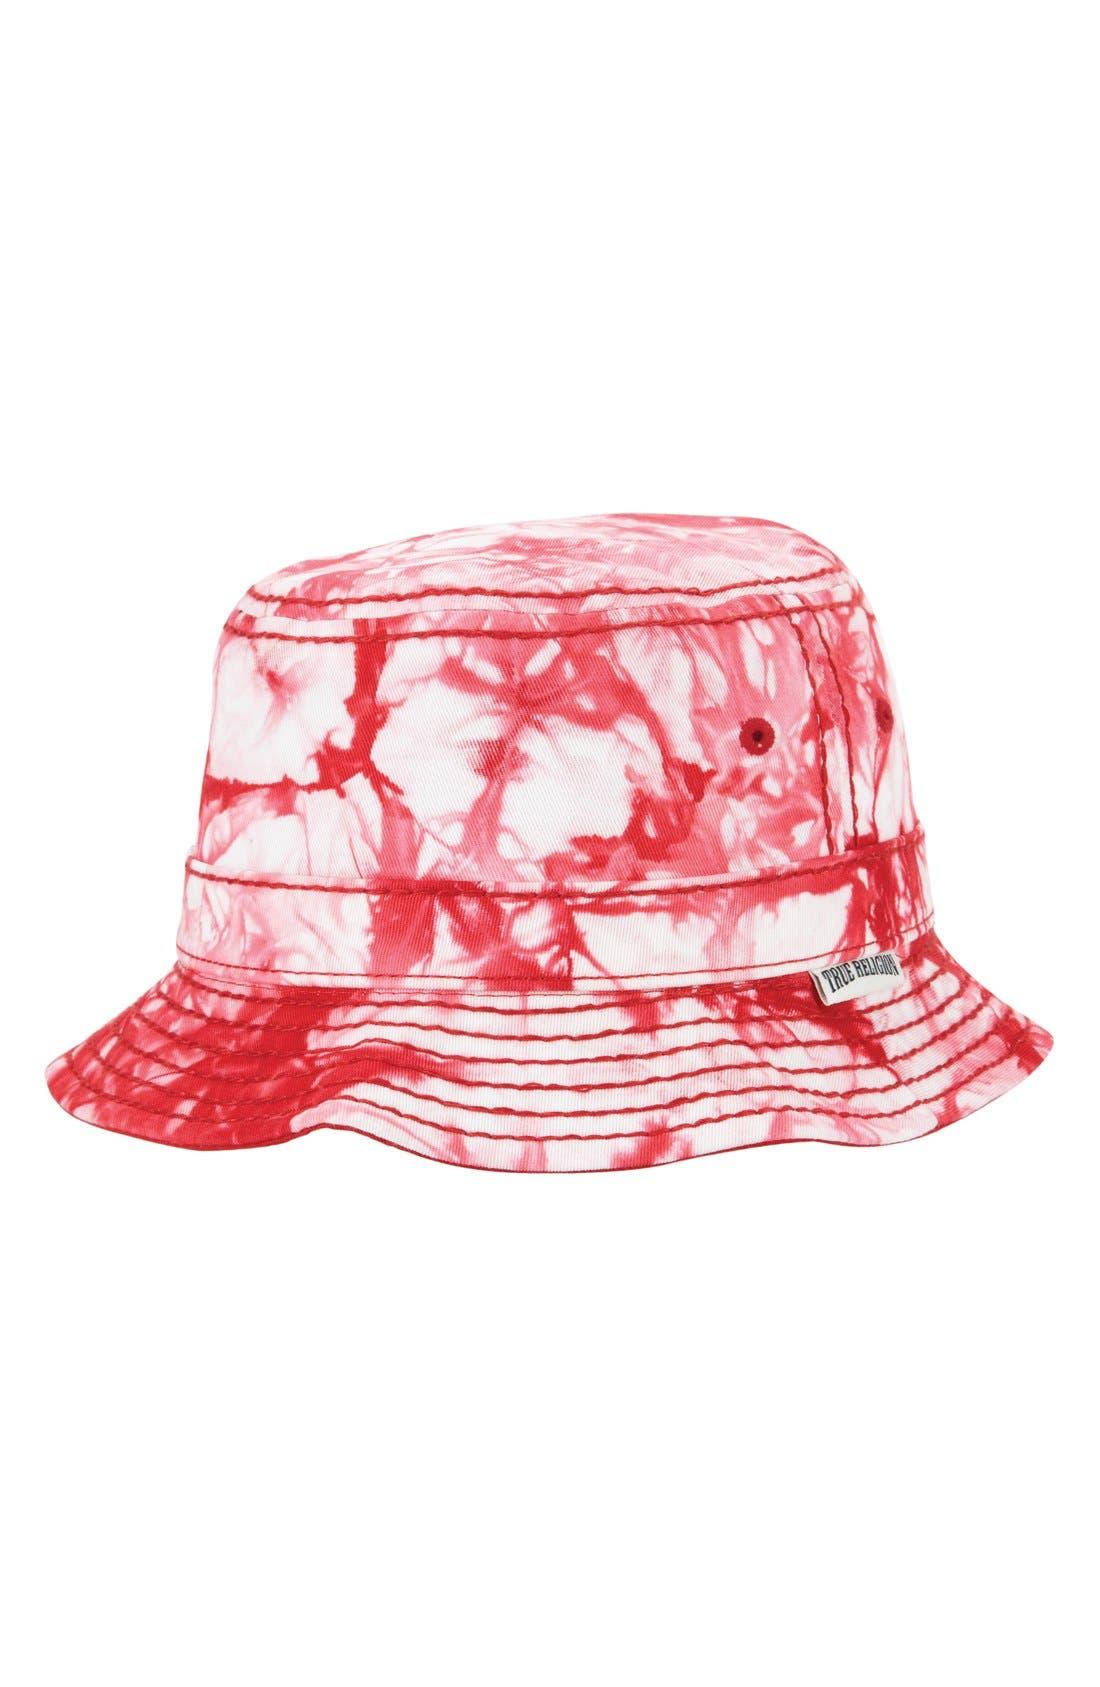 Marble Dye Bucket Hat,                         Main,                         color, True Red